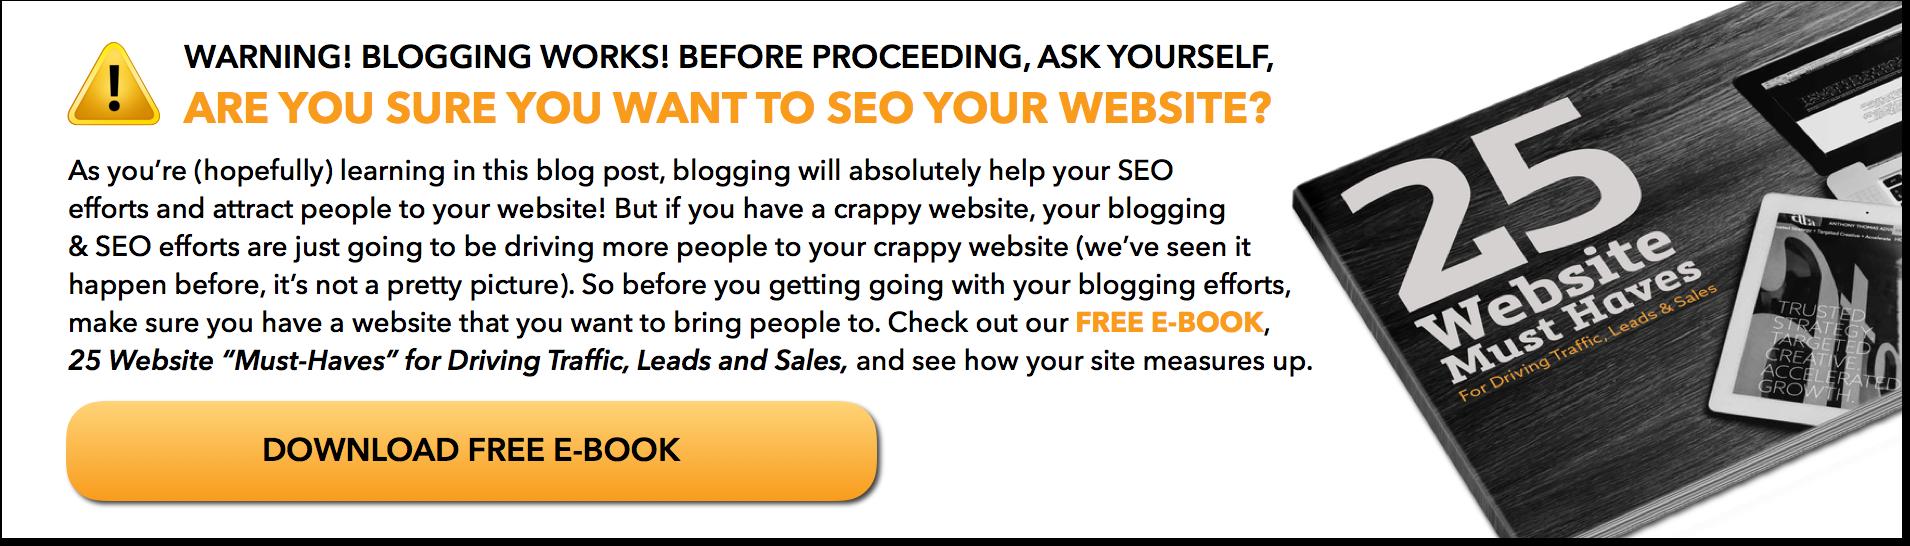 25-Website-Must-Haves-Download-CTA-for-Blogging-SEO